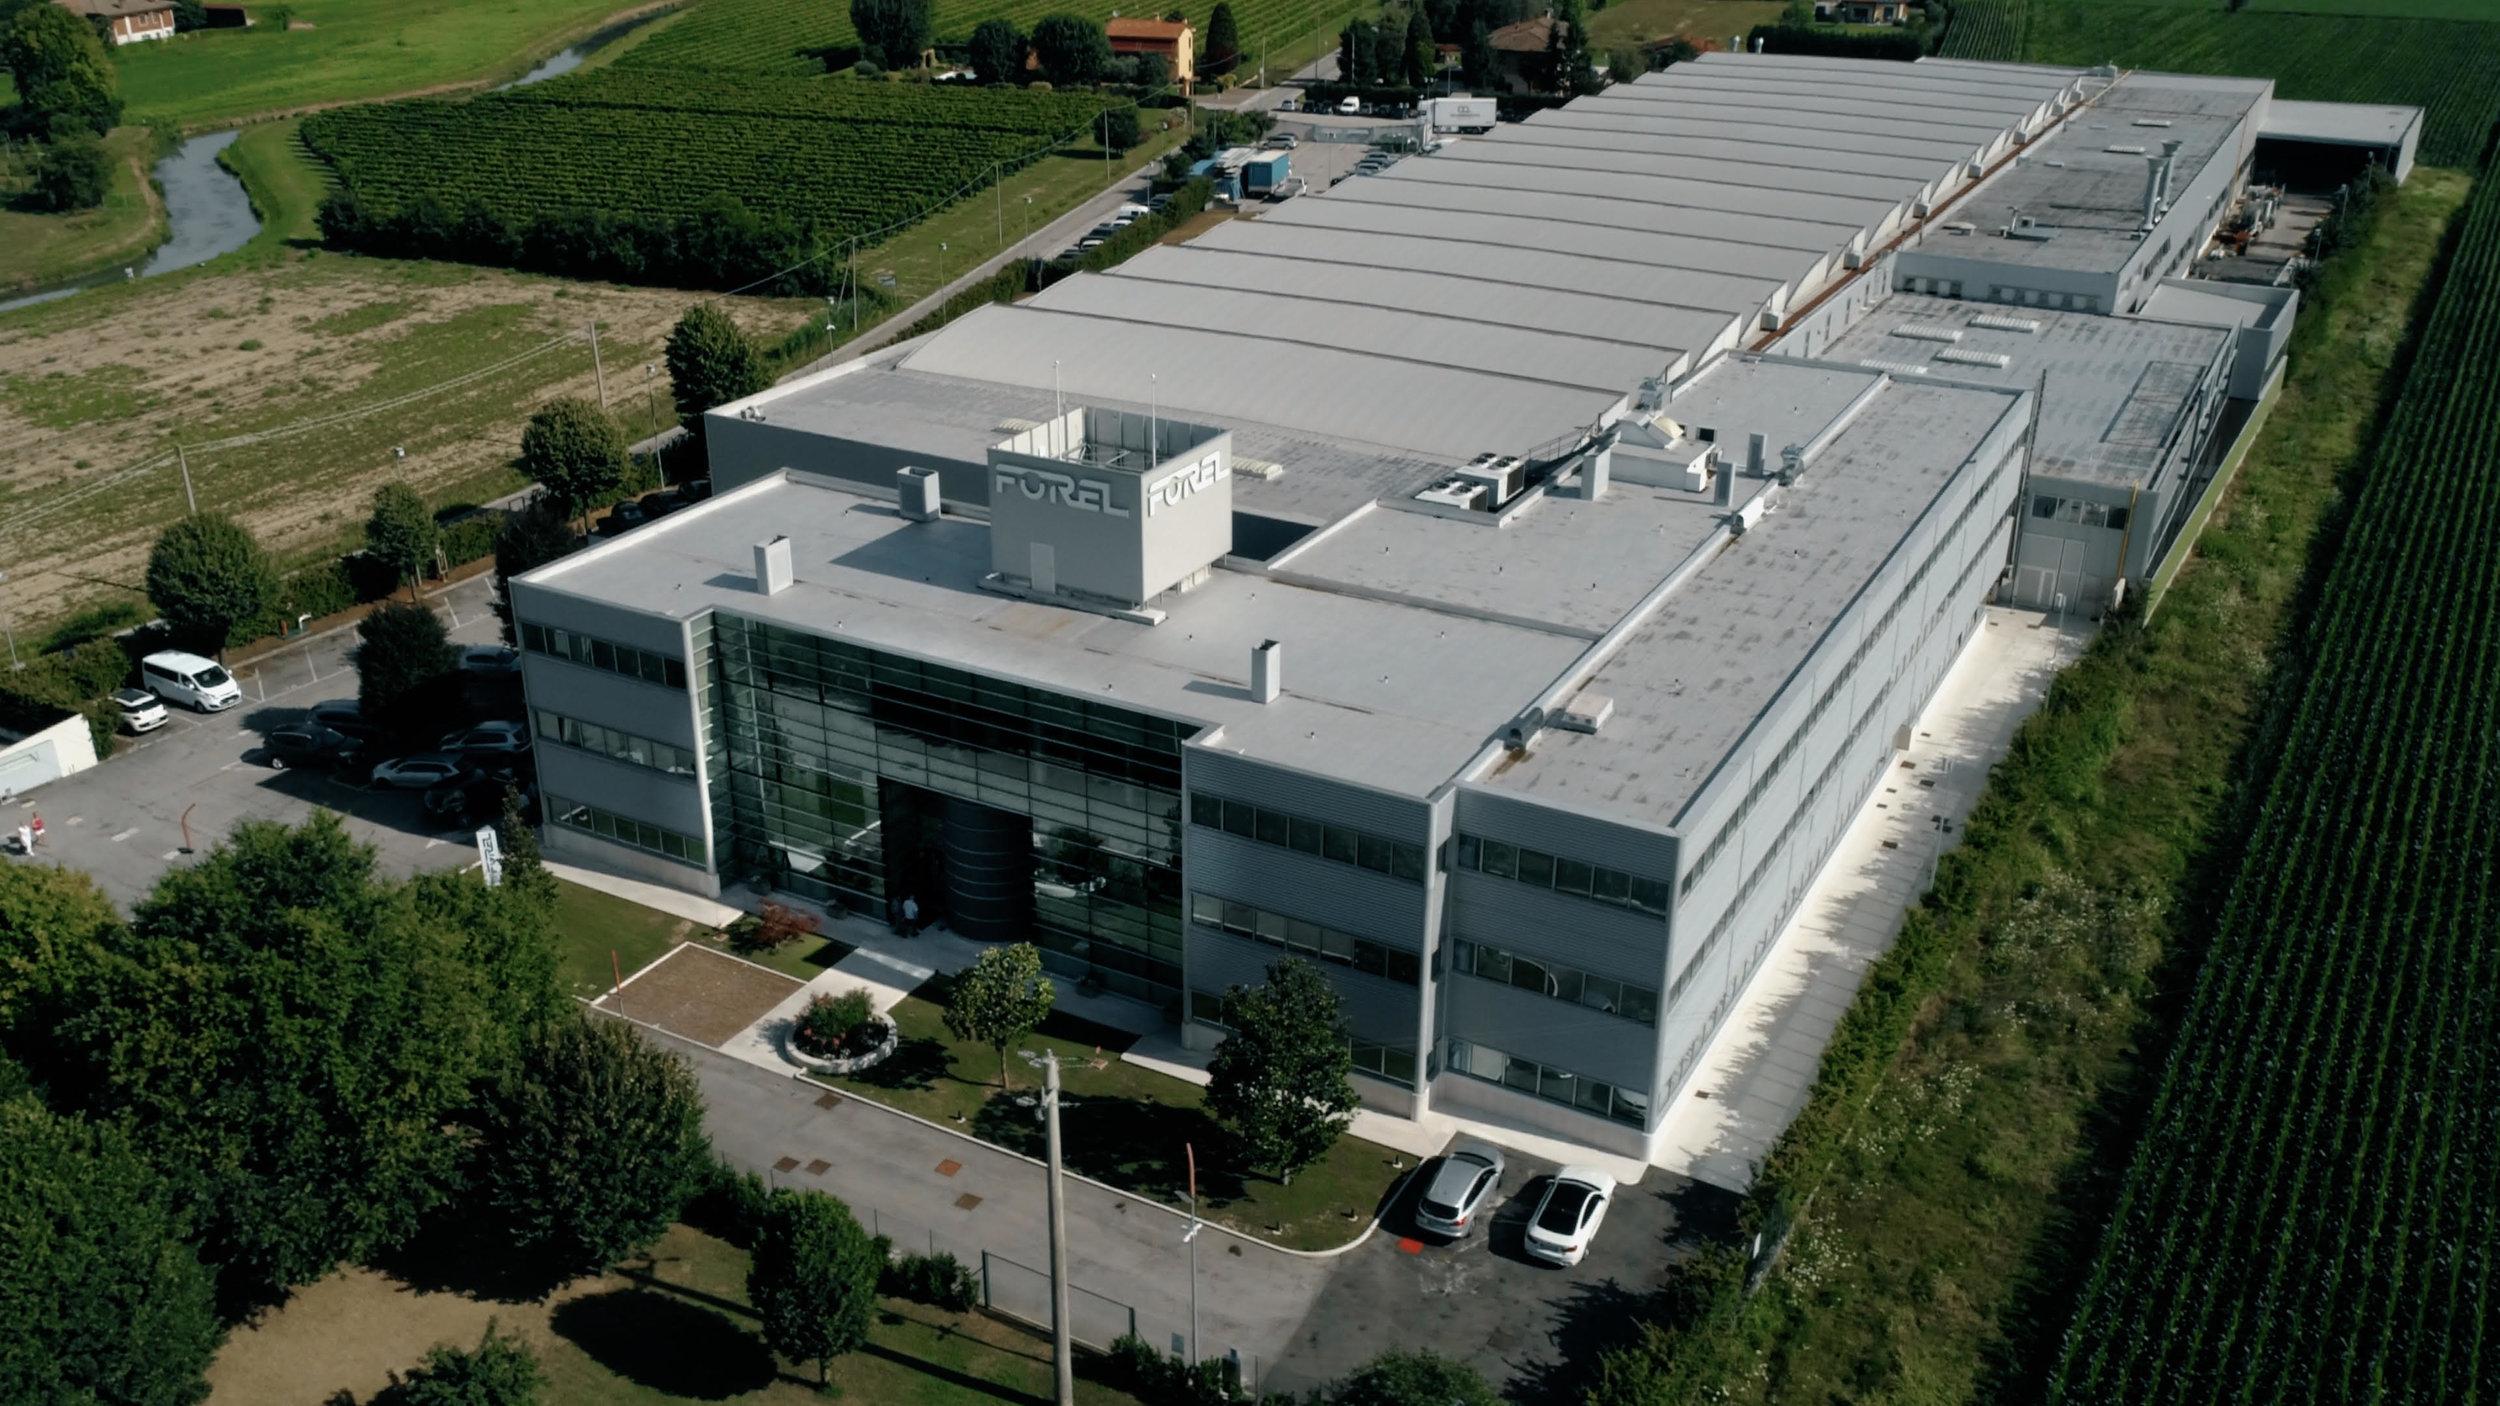 Forel Headquarters in Roncade (Treviso)